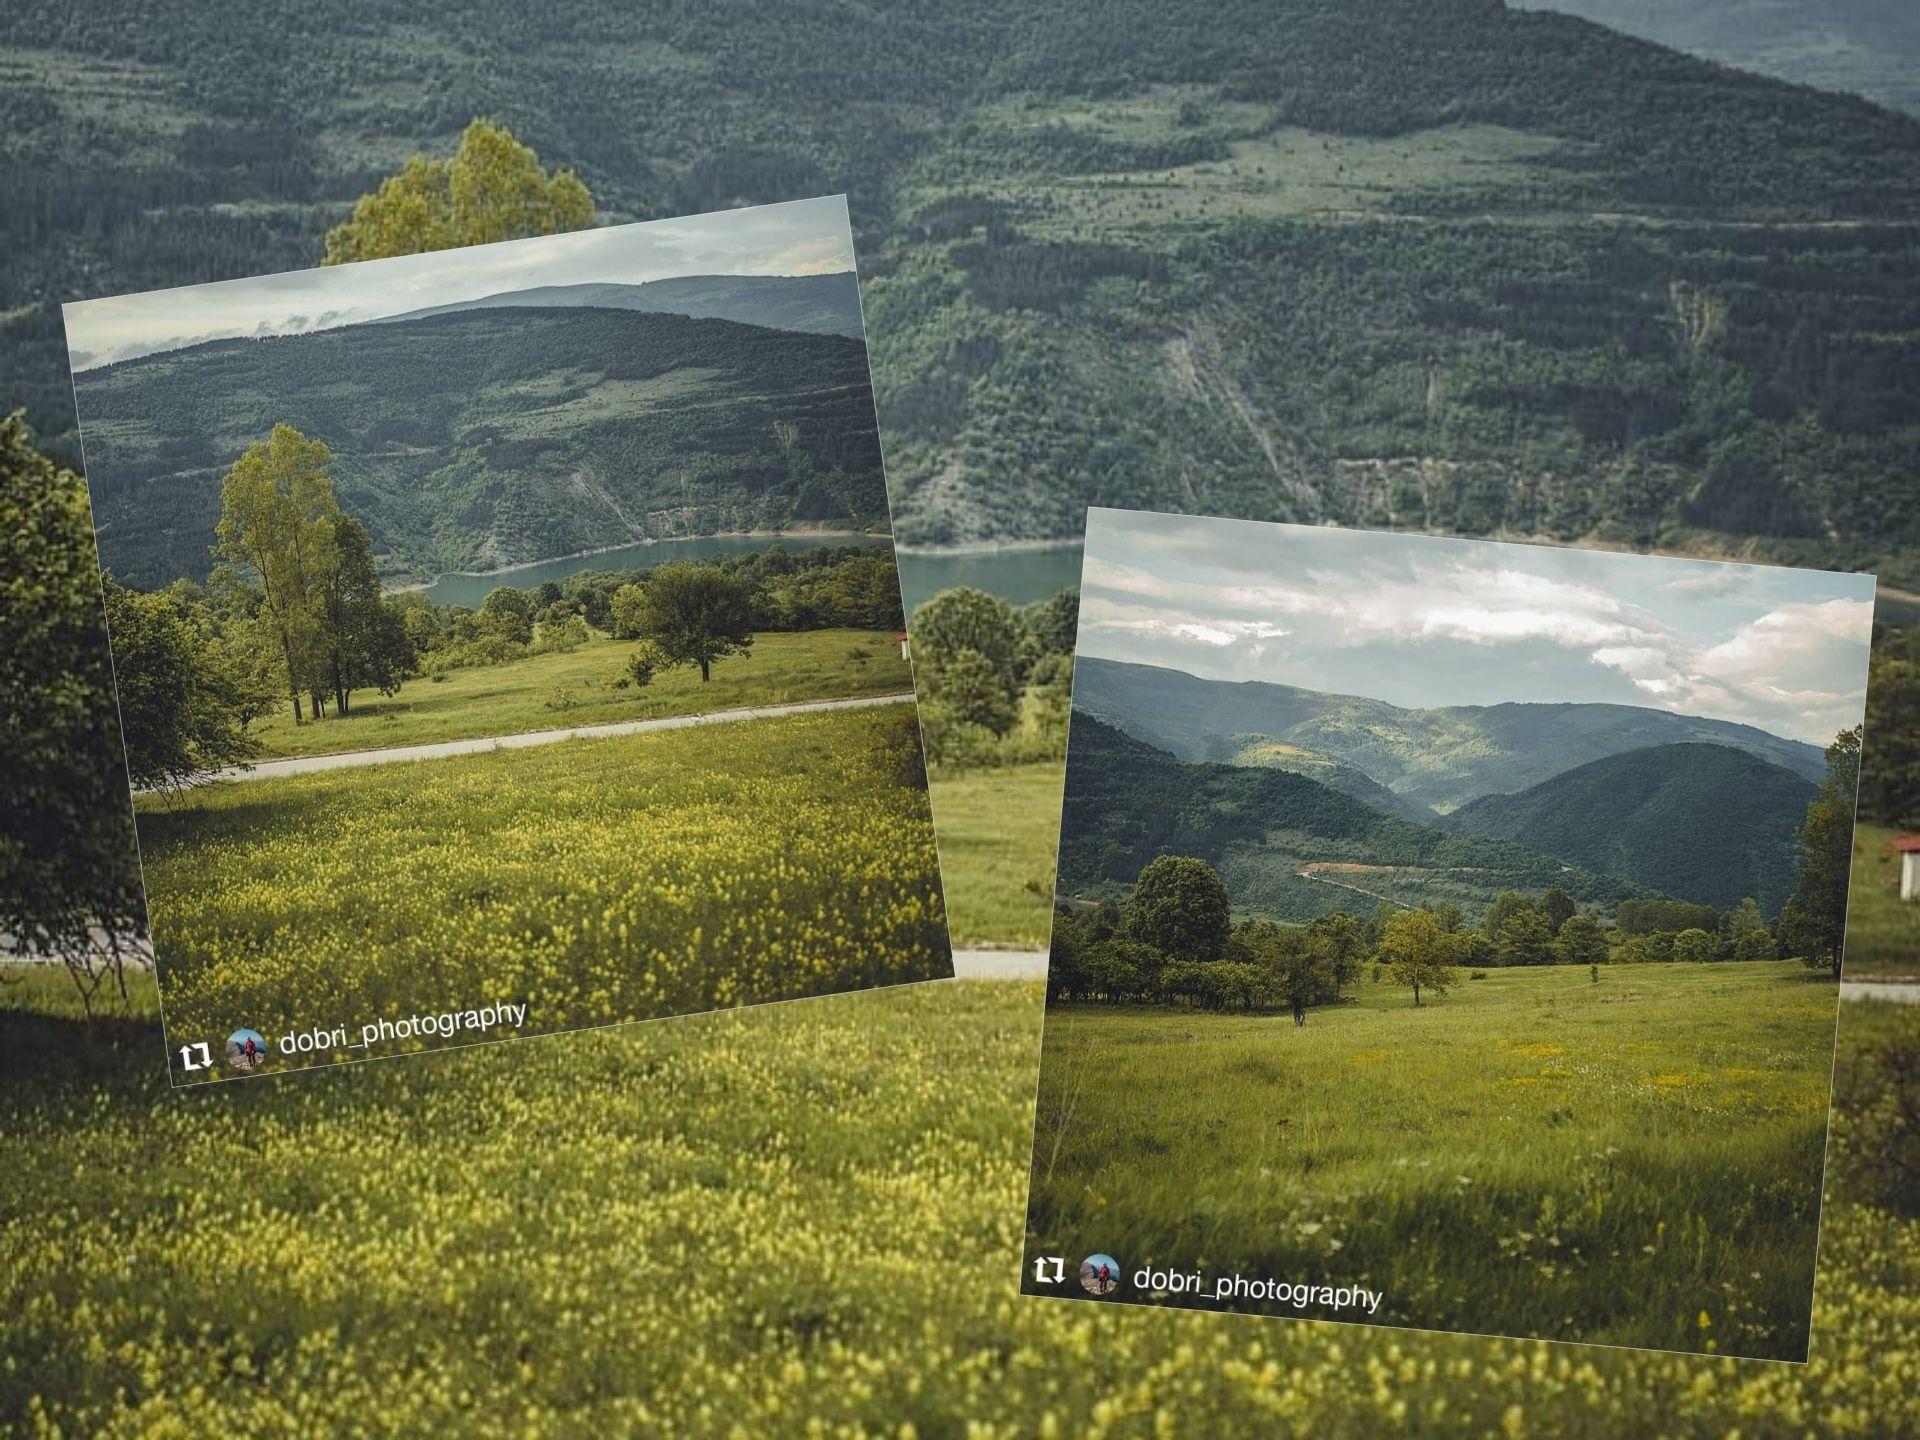 Lepote jezera na Staroj planini #wheretoserbia . #pirot #serbia #priroda #prirodasrbije #zelena #jezero #Zavoj #zavojskojezero #landscape #nature #naturephotography #beautiful #naturelovers #wanderlust #canon #hiking_hobby #hiking👣 #balkanmountains #сербия #србија #путешествие #obidjisrbiju #staraplanina #tripideas #srbijauslikama #prirodaidruštvo